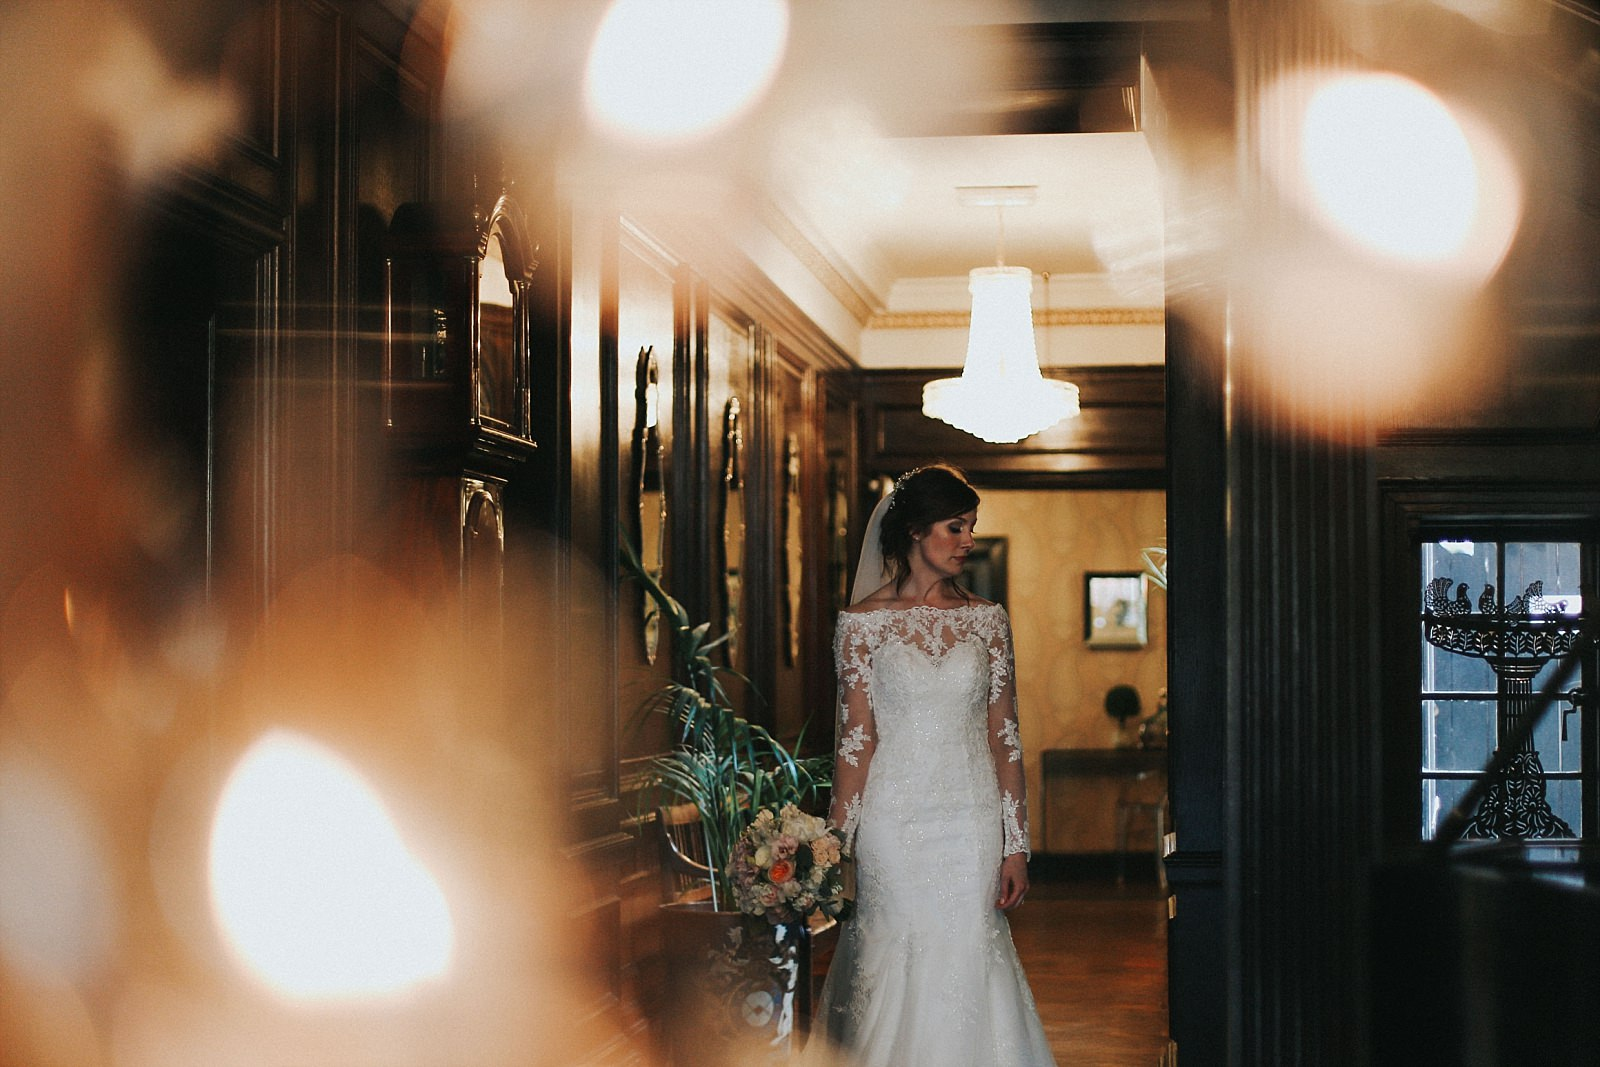 eaves hall wedding photographer captures the bride walking down the corridor